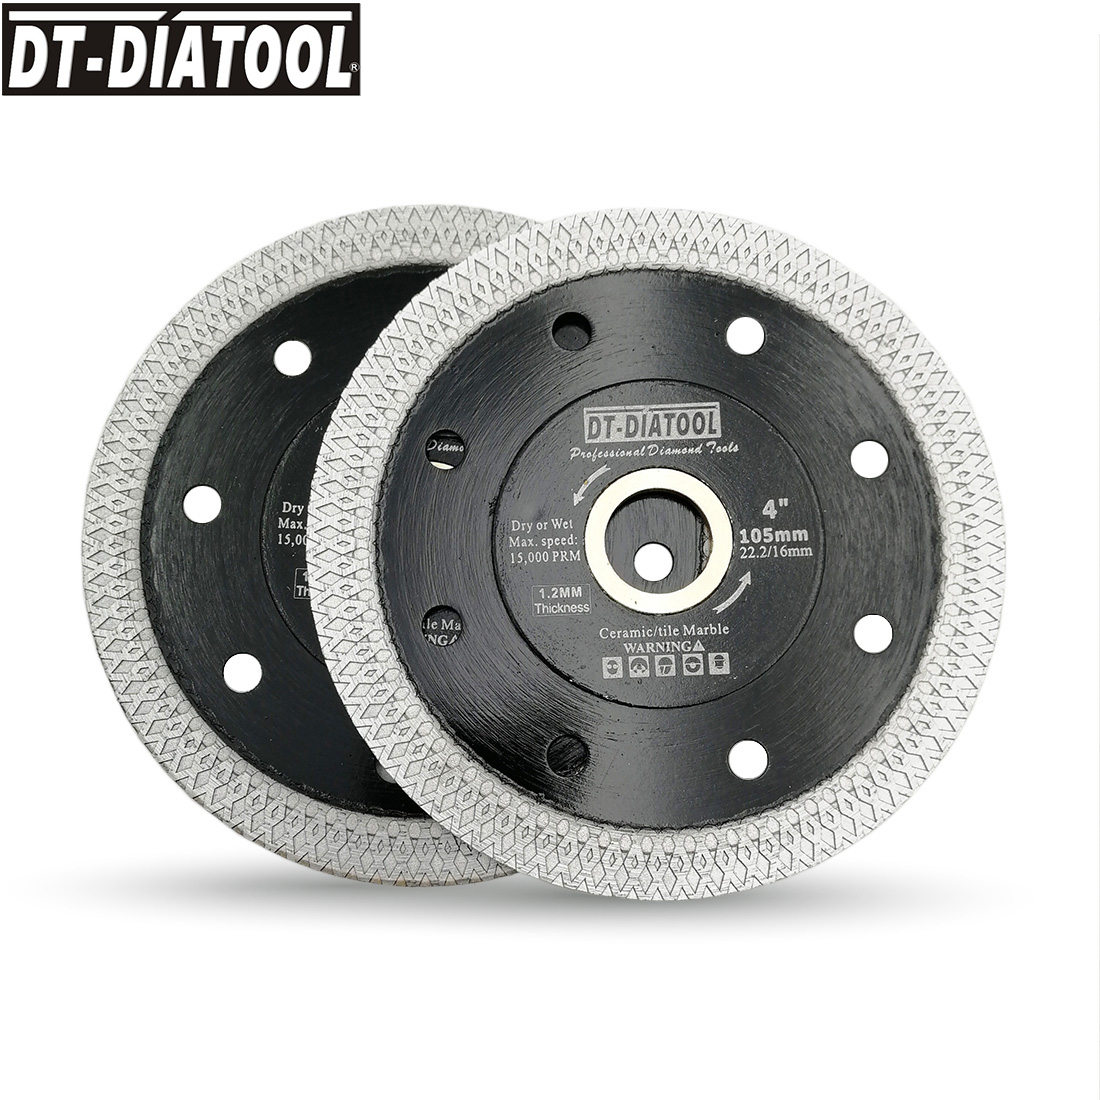 DT-DIATOOL 2pcs Dia 105/115/125 Mm Diamond Superthin Saw Blades X Mesh Turbo Rim Segment Cutting Disc Tile Ceramic Marble Blade